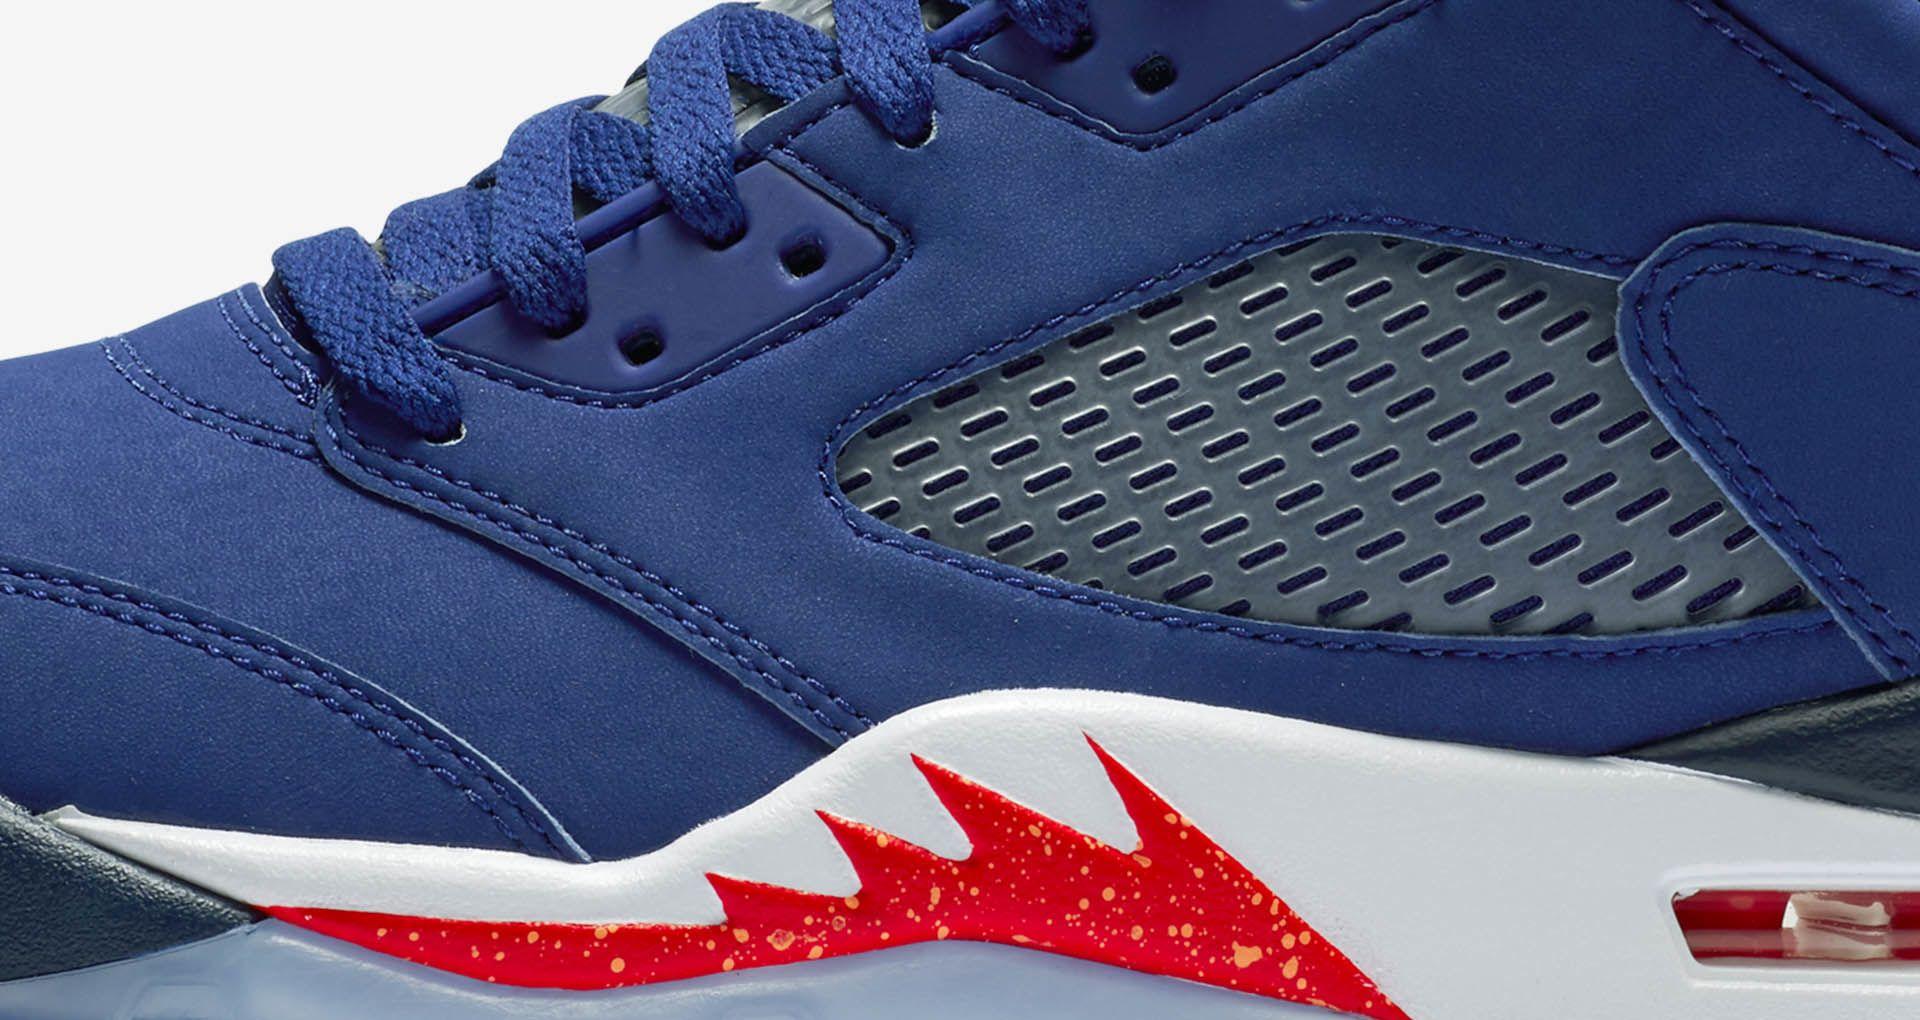 060a4df315a7a1 Air Jordan 5 Retro Low  Royal Blue  Release Date. Nike+ SNKRS